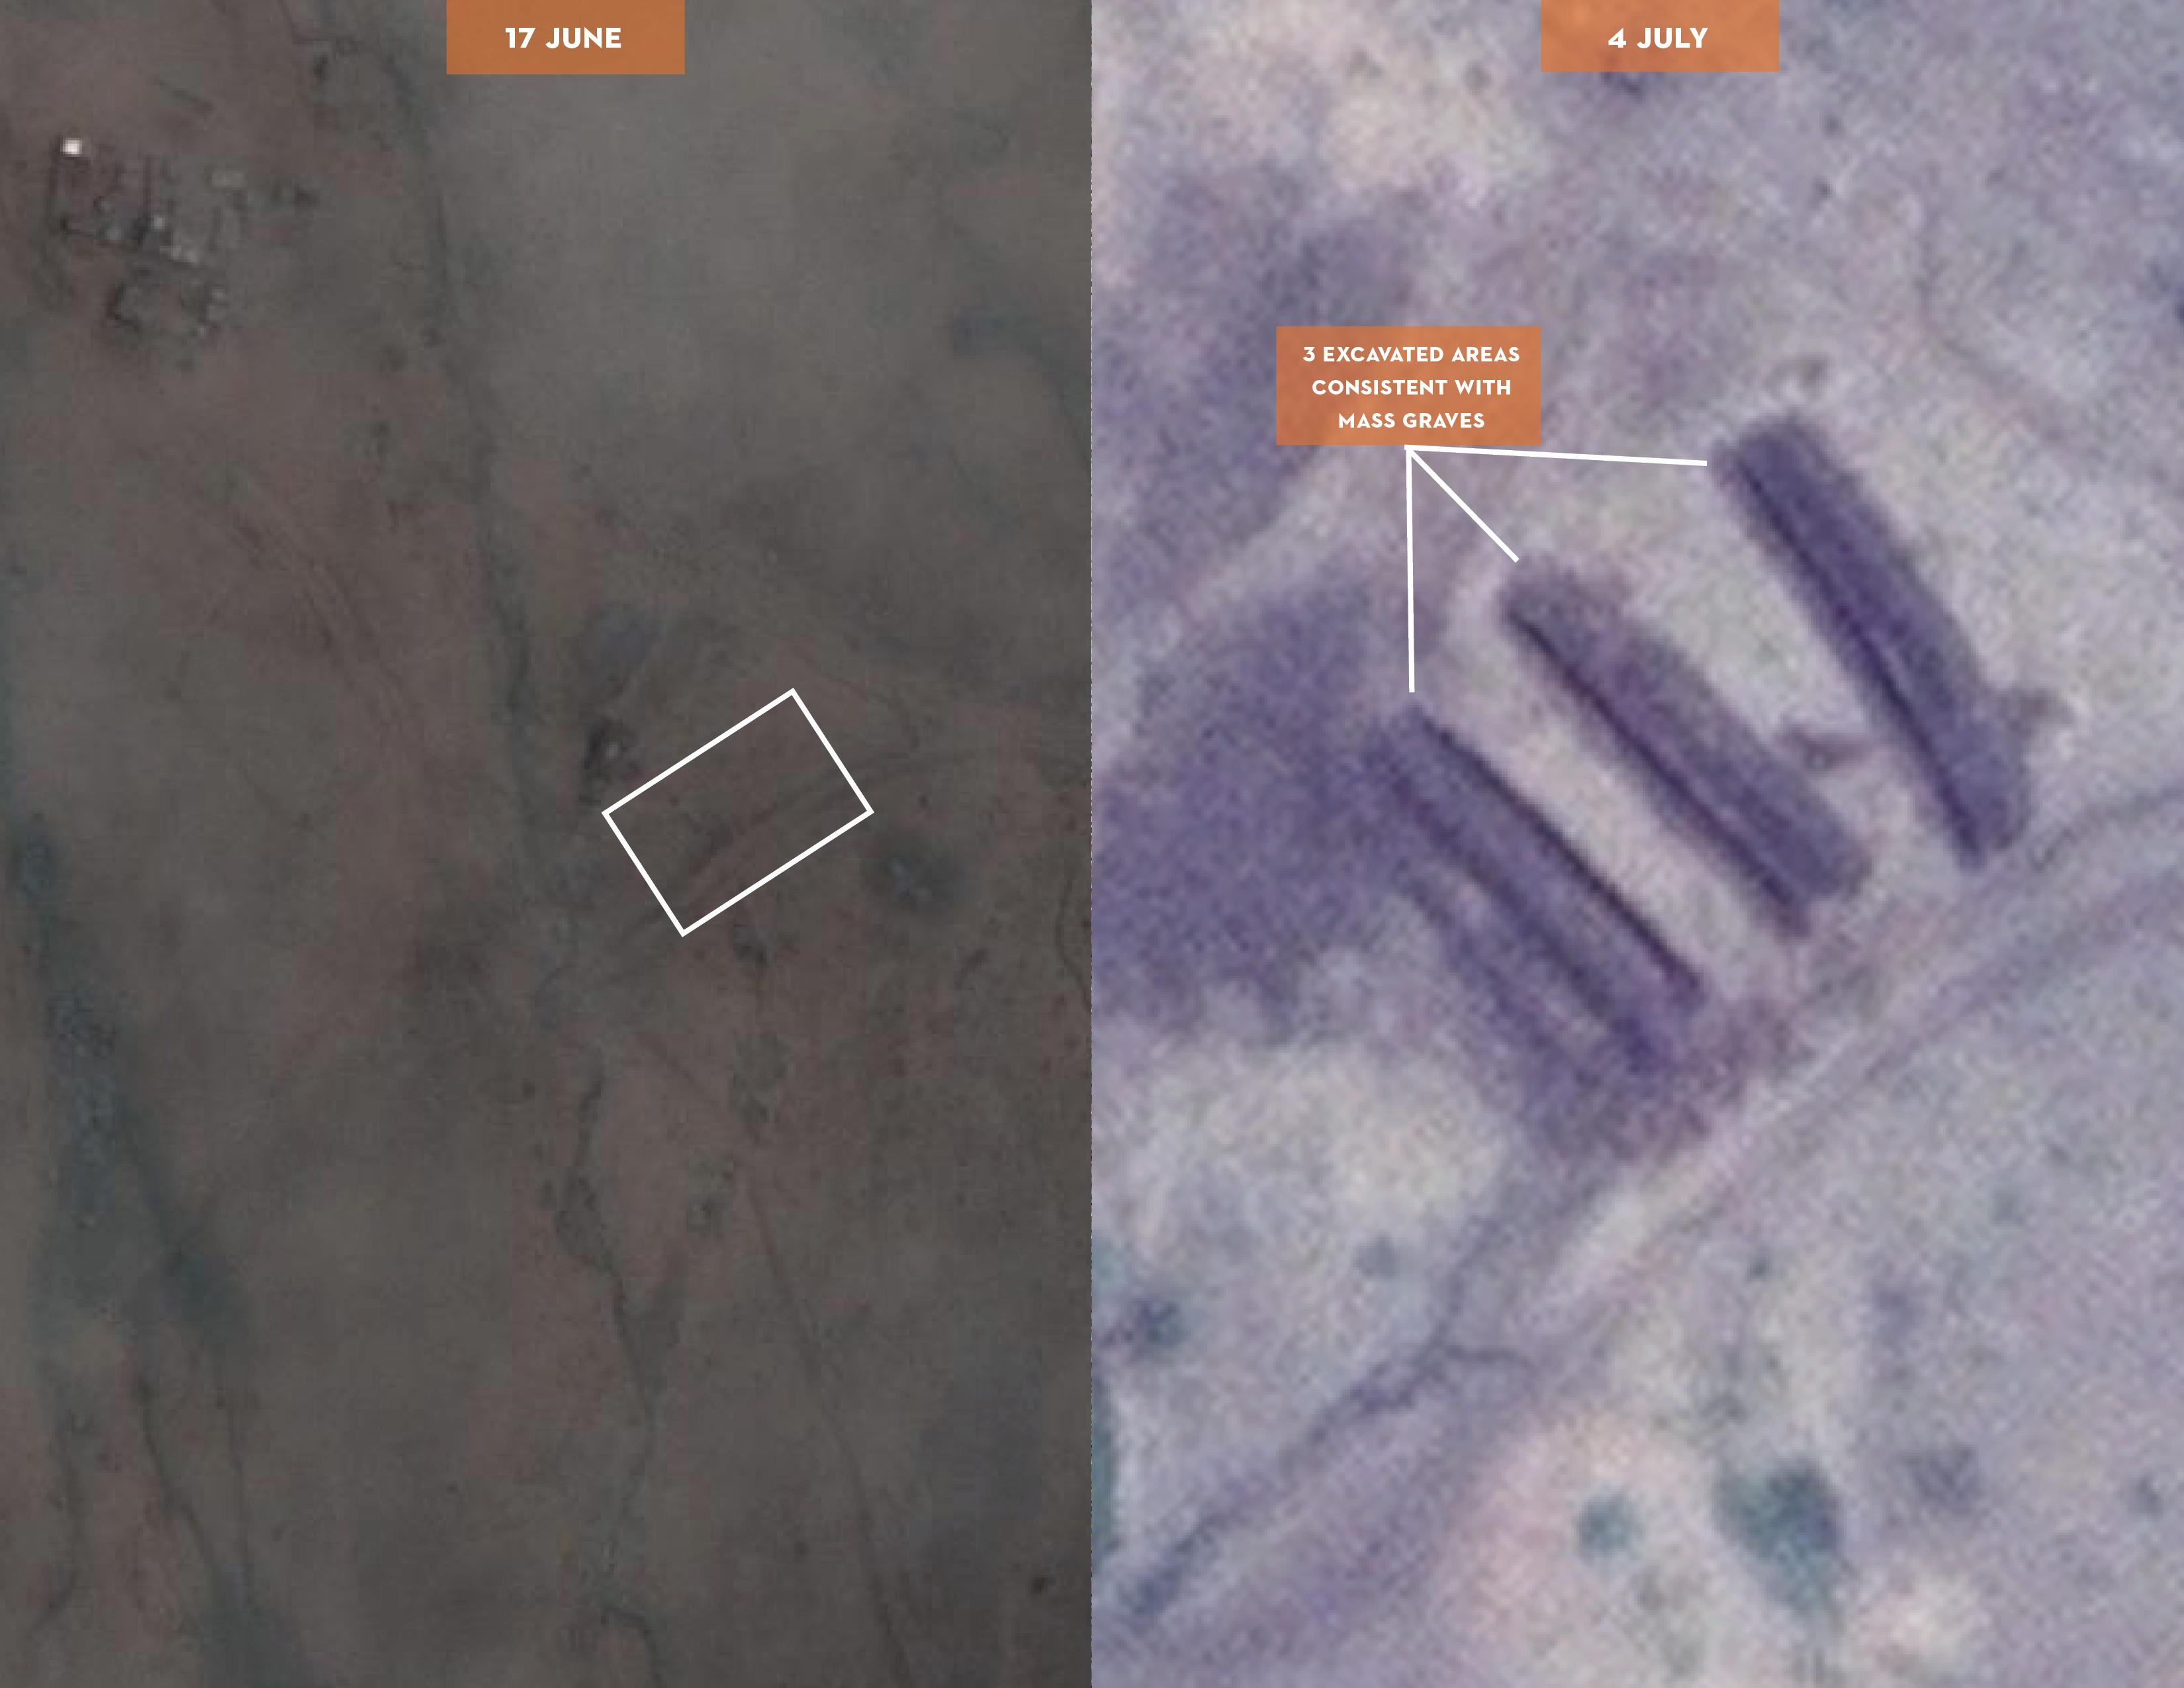 SSP16 Fig1 plain: Potential Mass Graves Near Tilo School